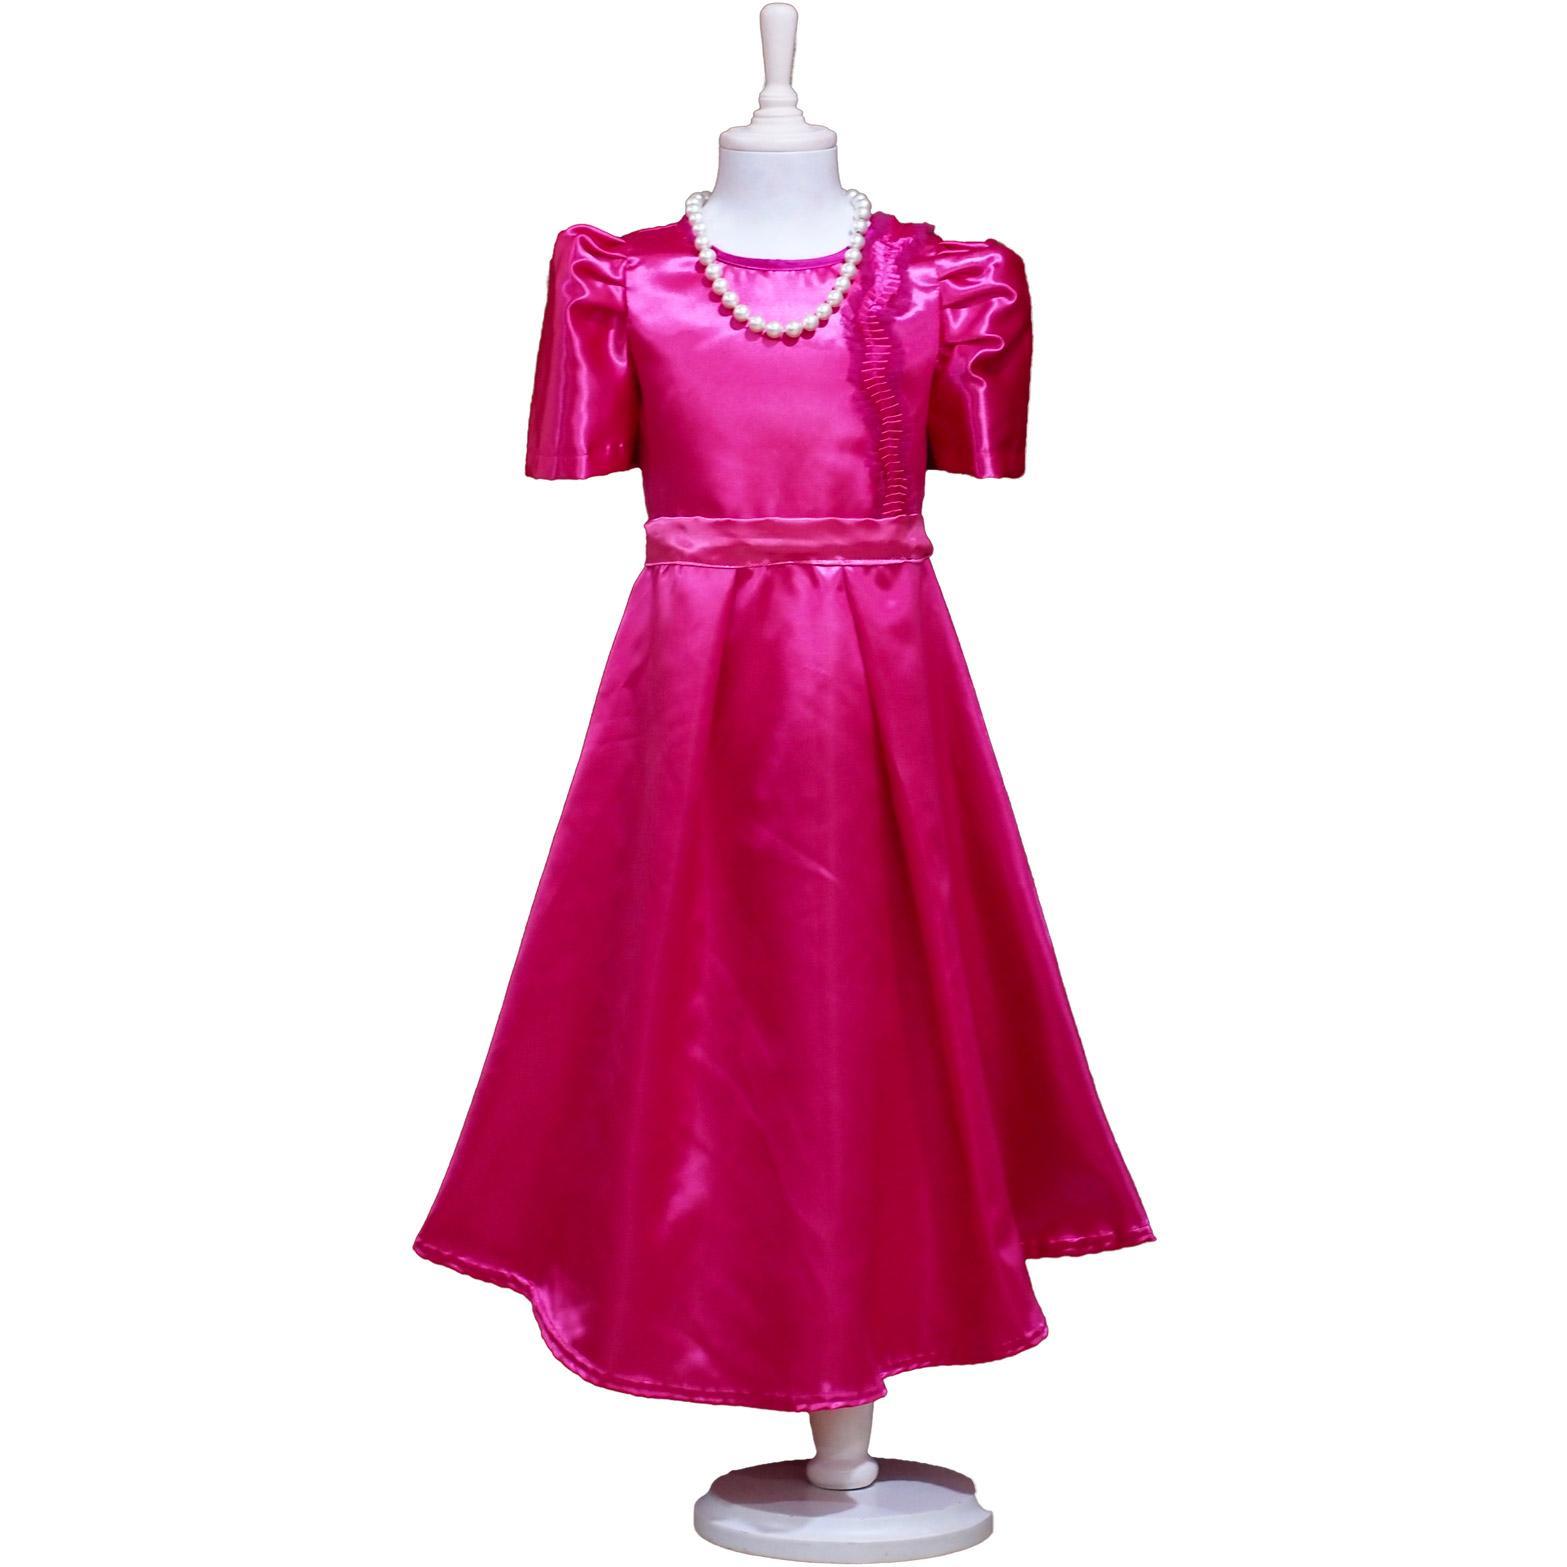 Red Signature Clothing Philippines: Red Signature Clothing price ...